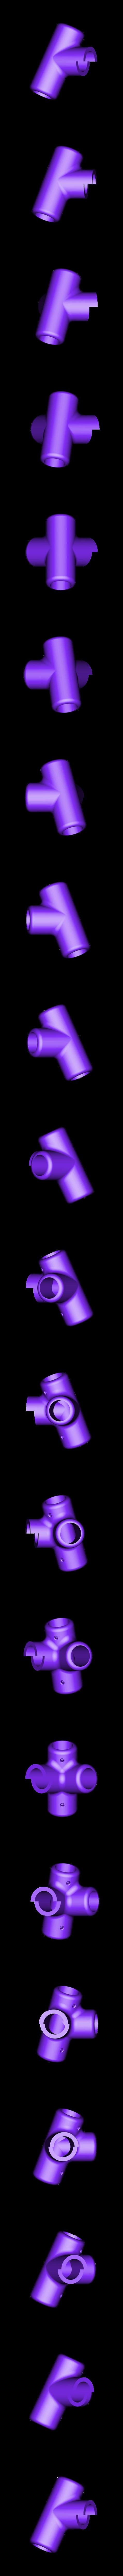 piece_4.stl Download free STL file Picochaise • 3D printer object, PierreR